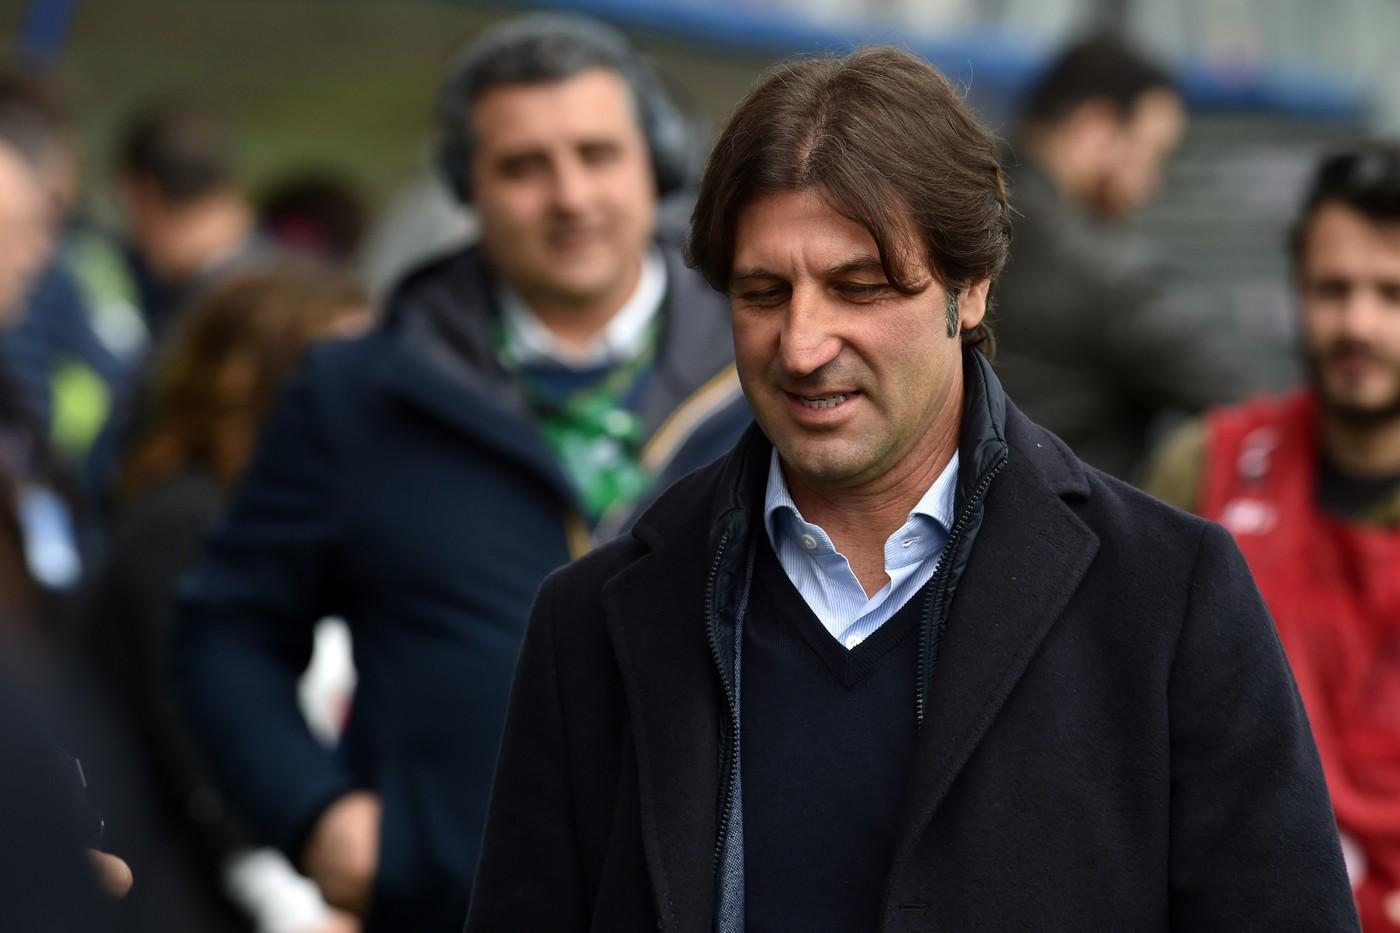 Francesco Mazzitello/LaPresse